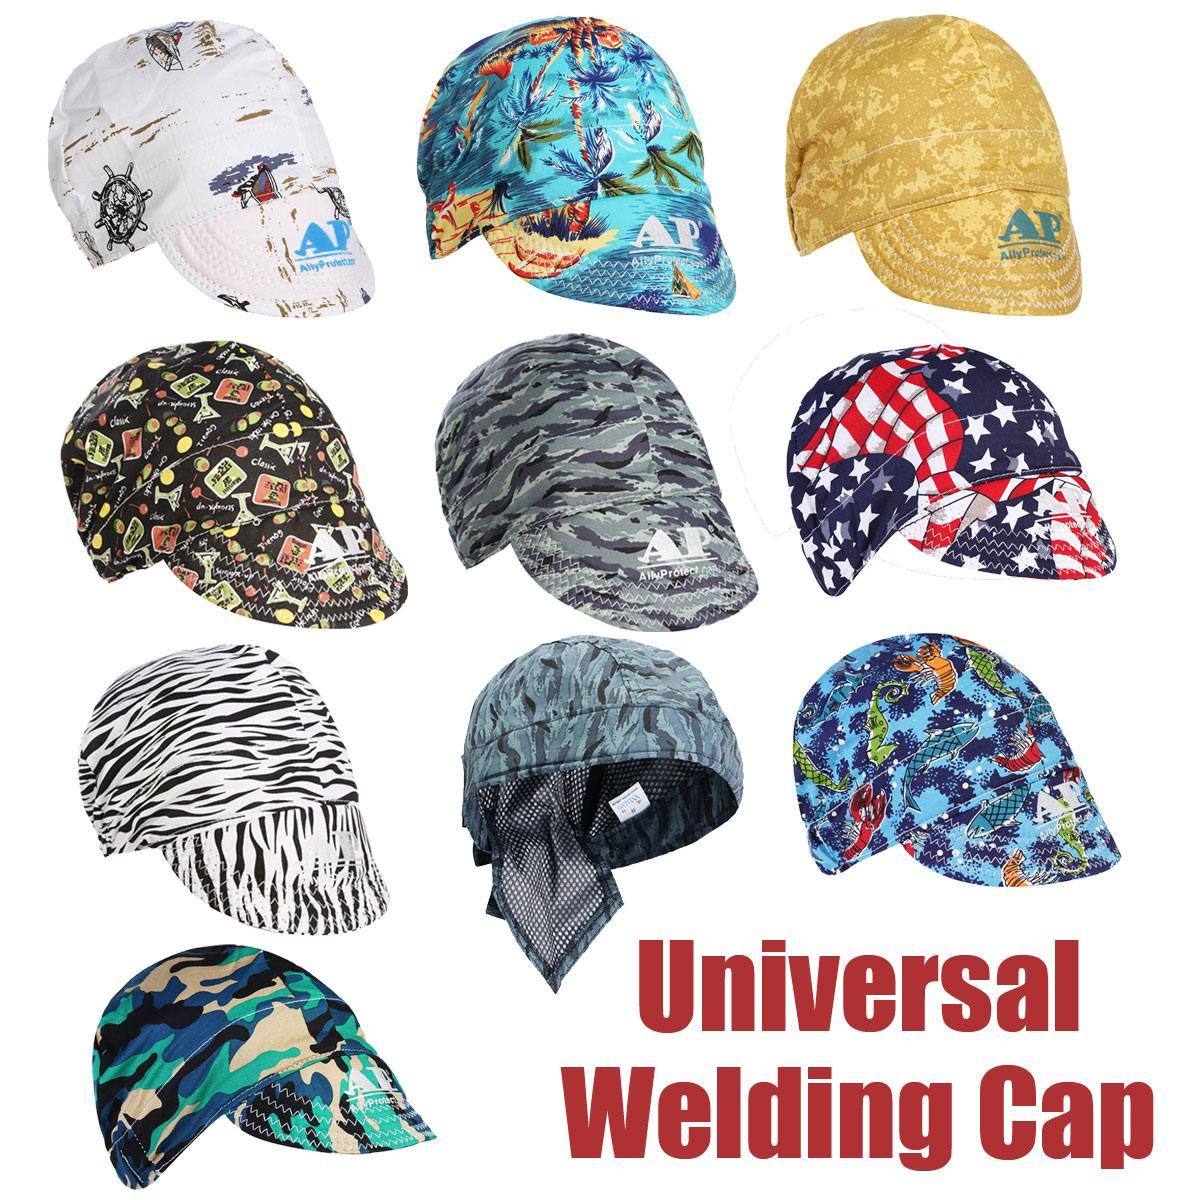 7 Shapes Elastic Welding Hat Sweat Absorption Welders Welding Protective Hat Cap Flame Resistant Head Full Protection Hoods